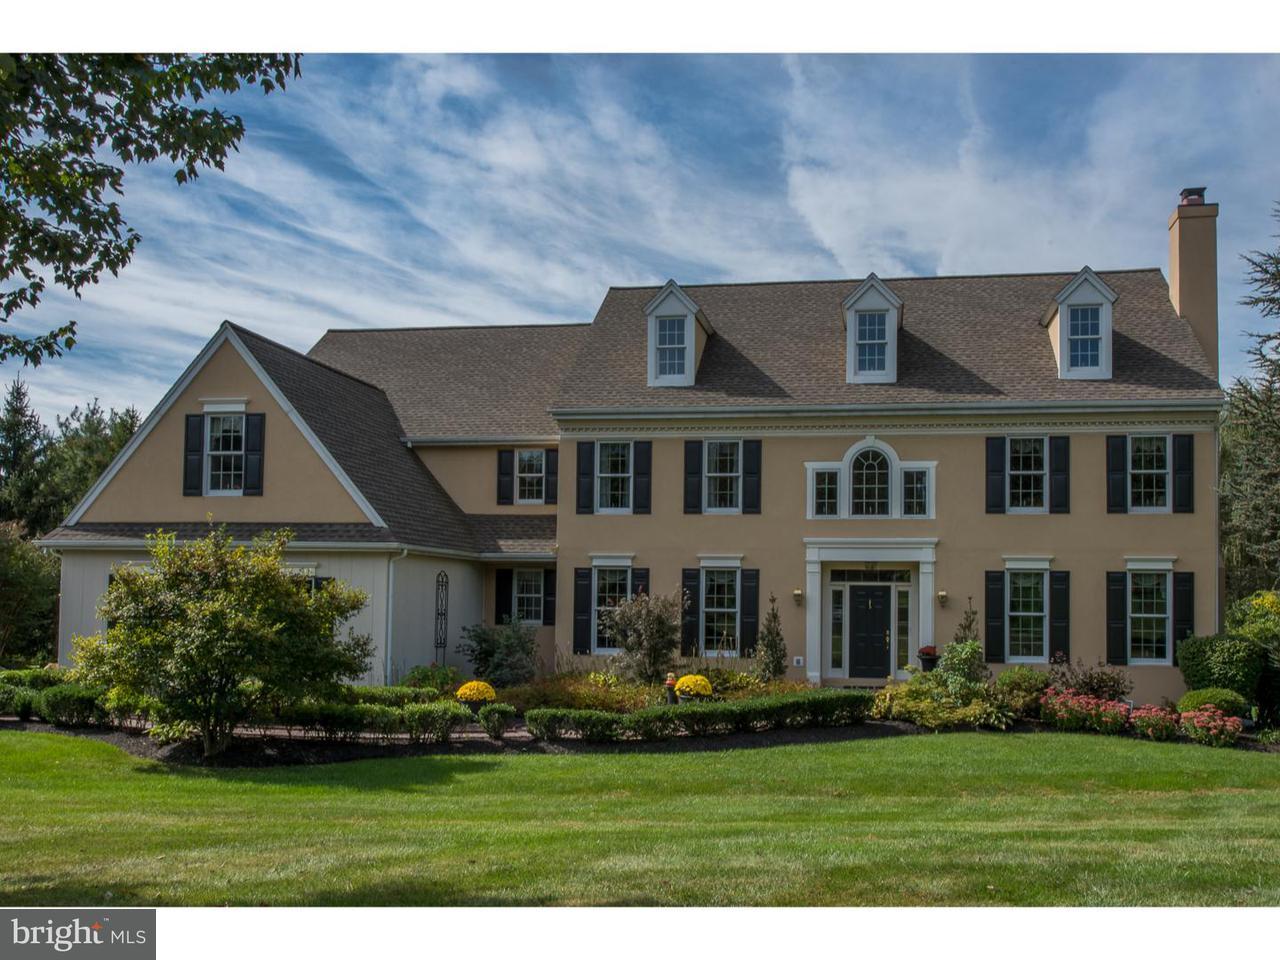 Single Family Home for Sale at 1159 AVONLEA Circle Glen Mills, Pennsylvania 19342 United States